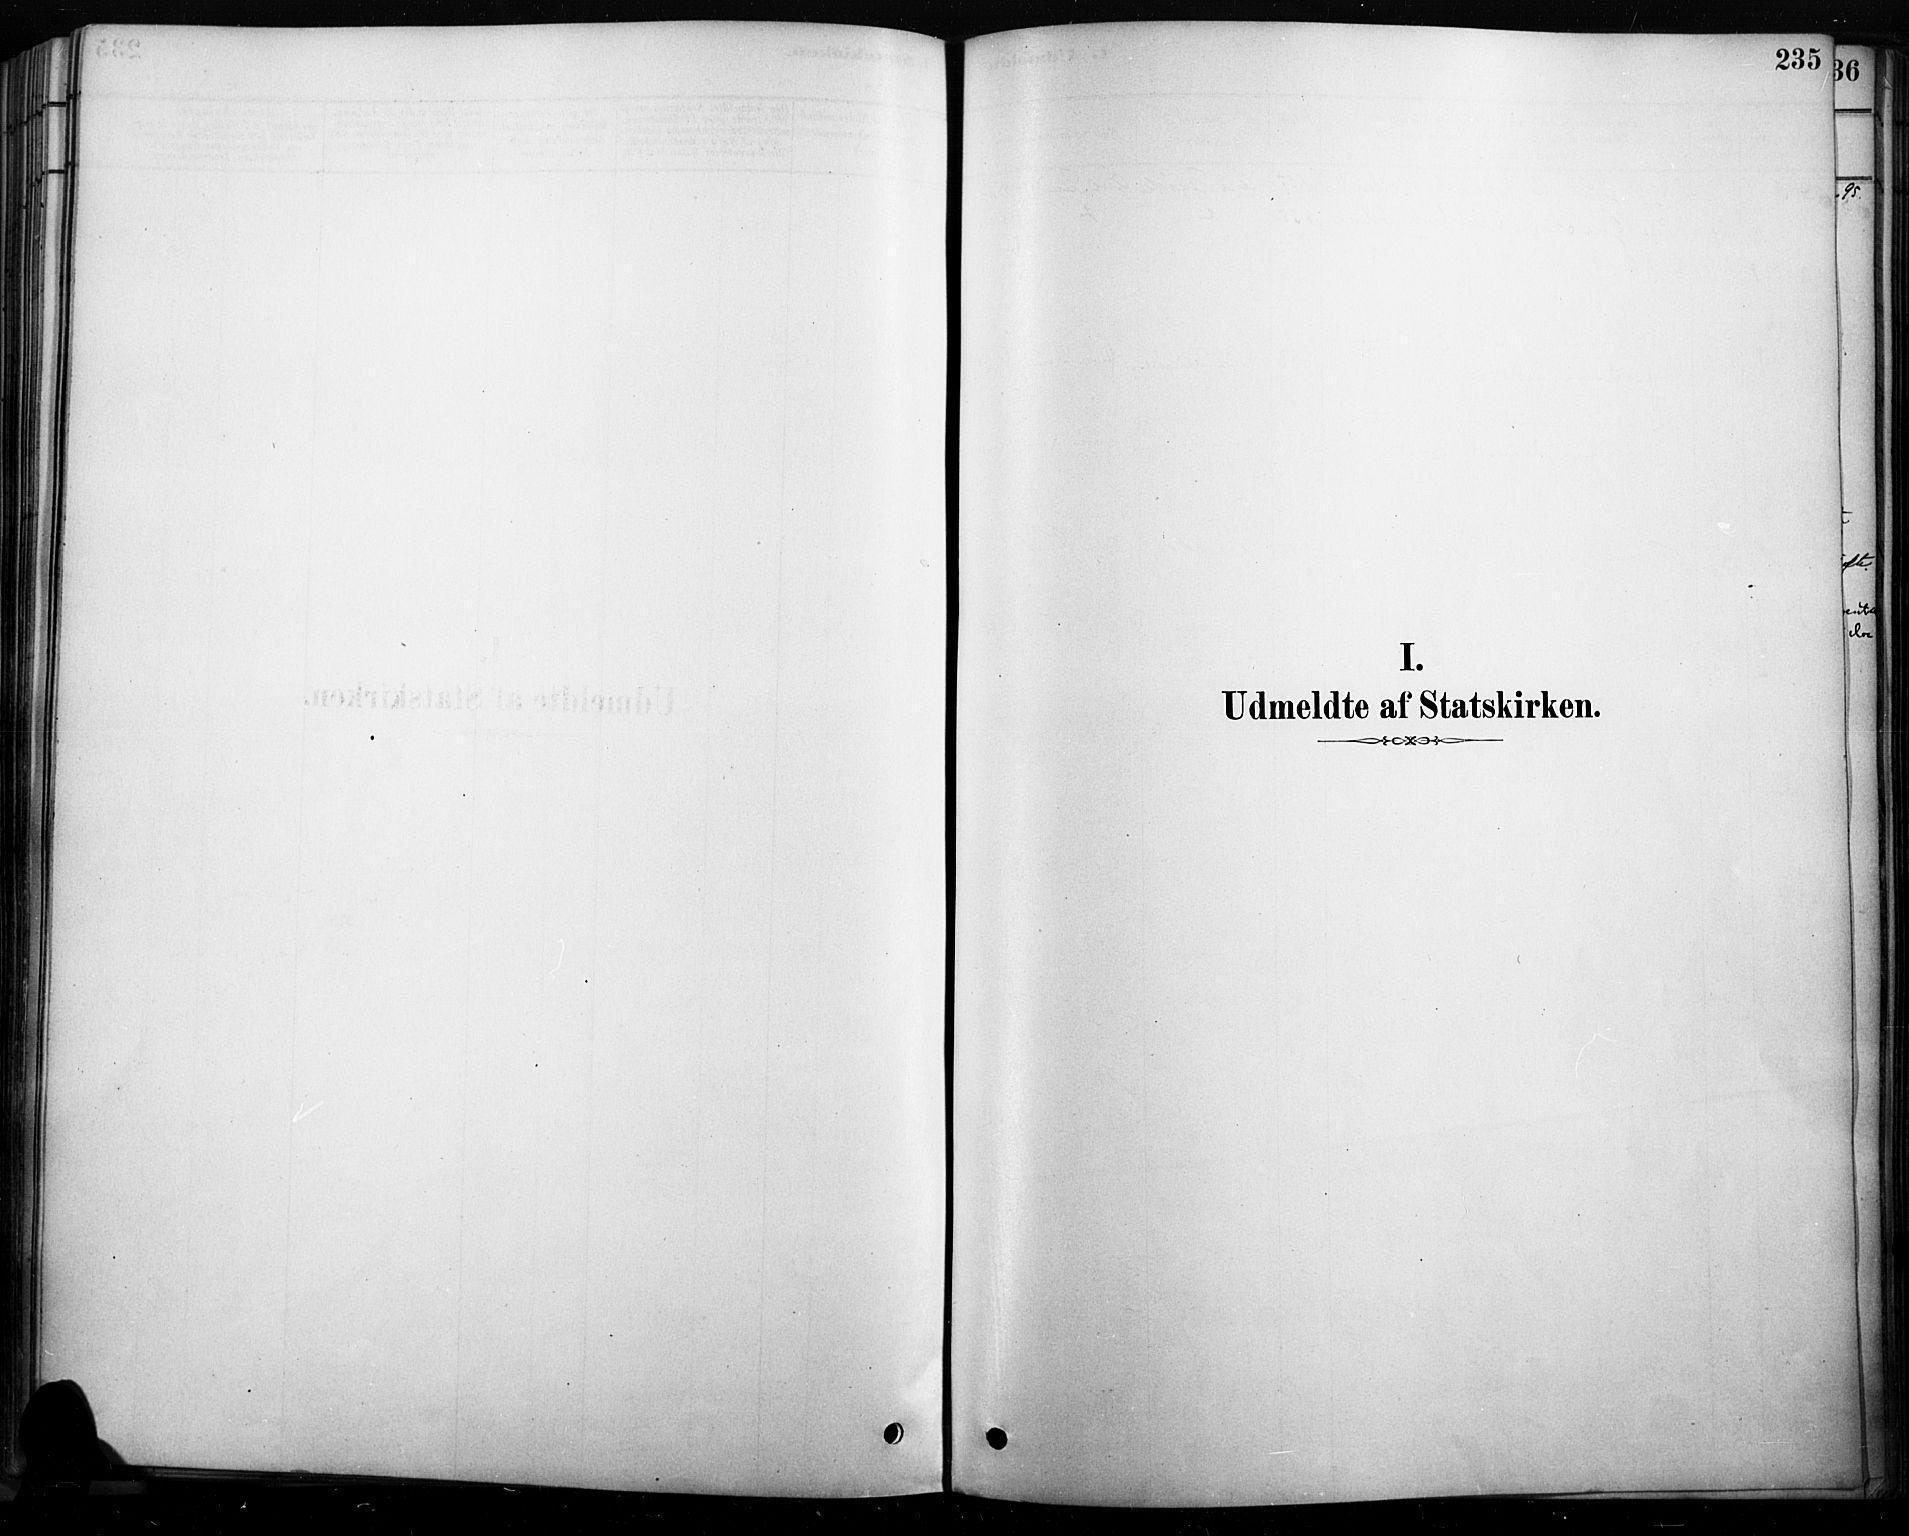 SAH, Rendalen prestekontor, H/Ha/Haa/L0009: Ministerialbok nr. 9, 1878-1901, s. 235